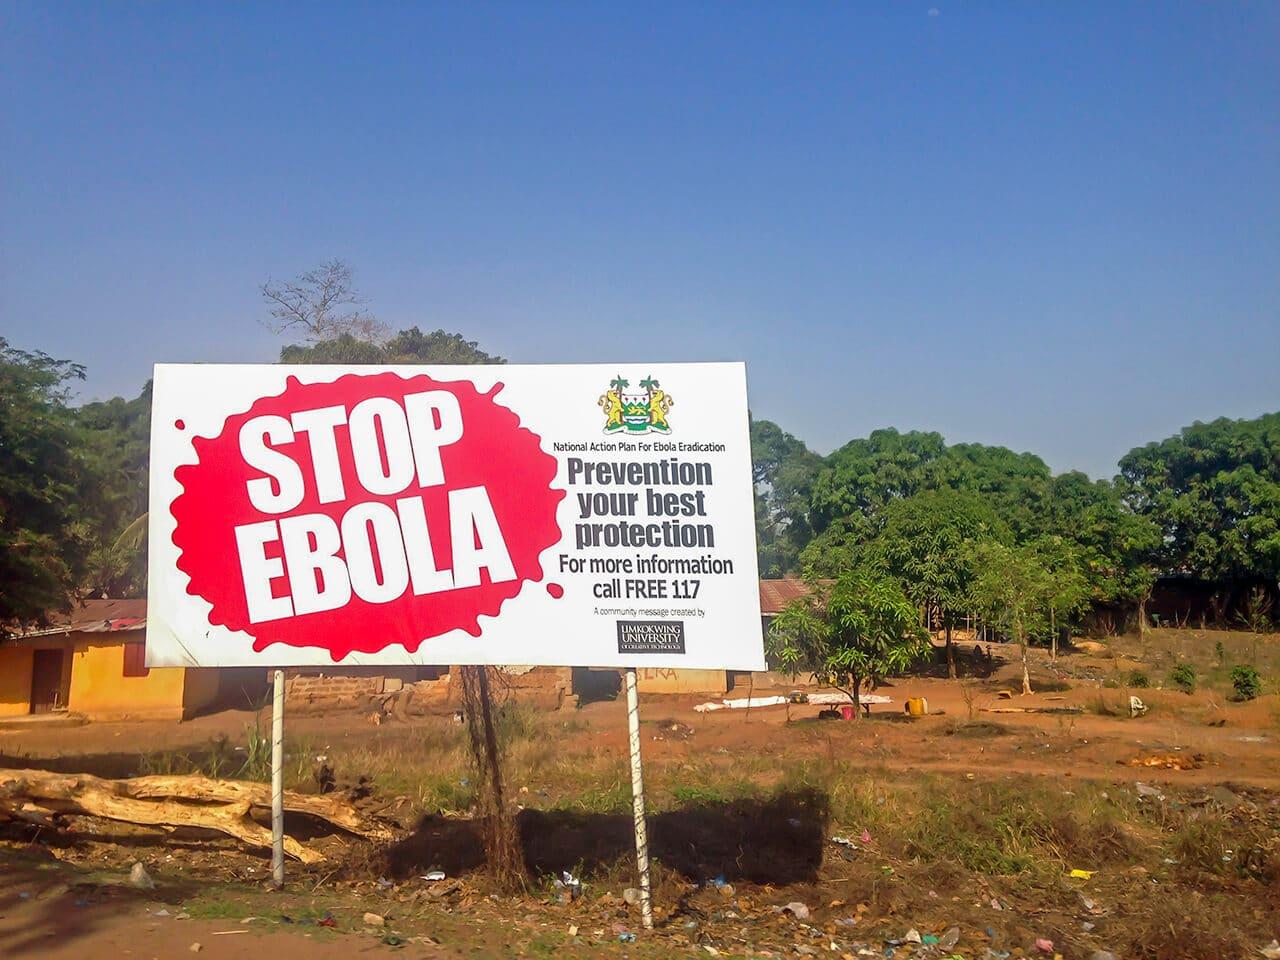 Travel is fatal to prejudice: Stop ebola sign in Sierra Leone